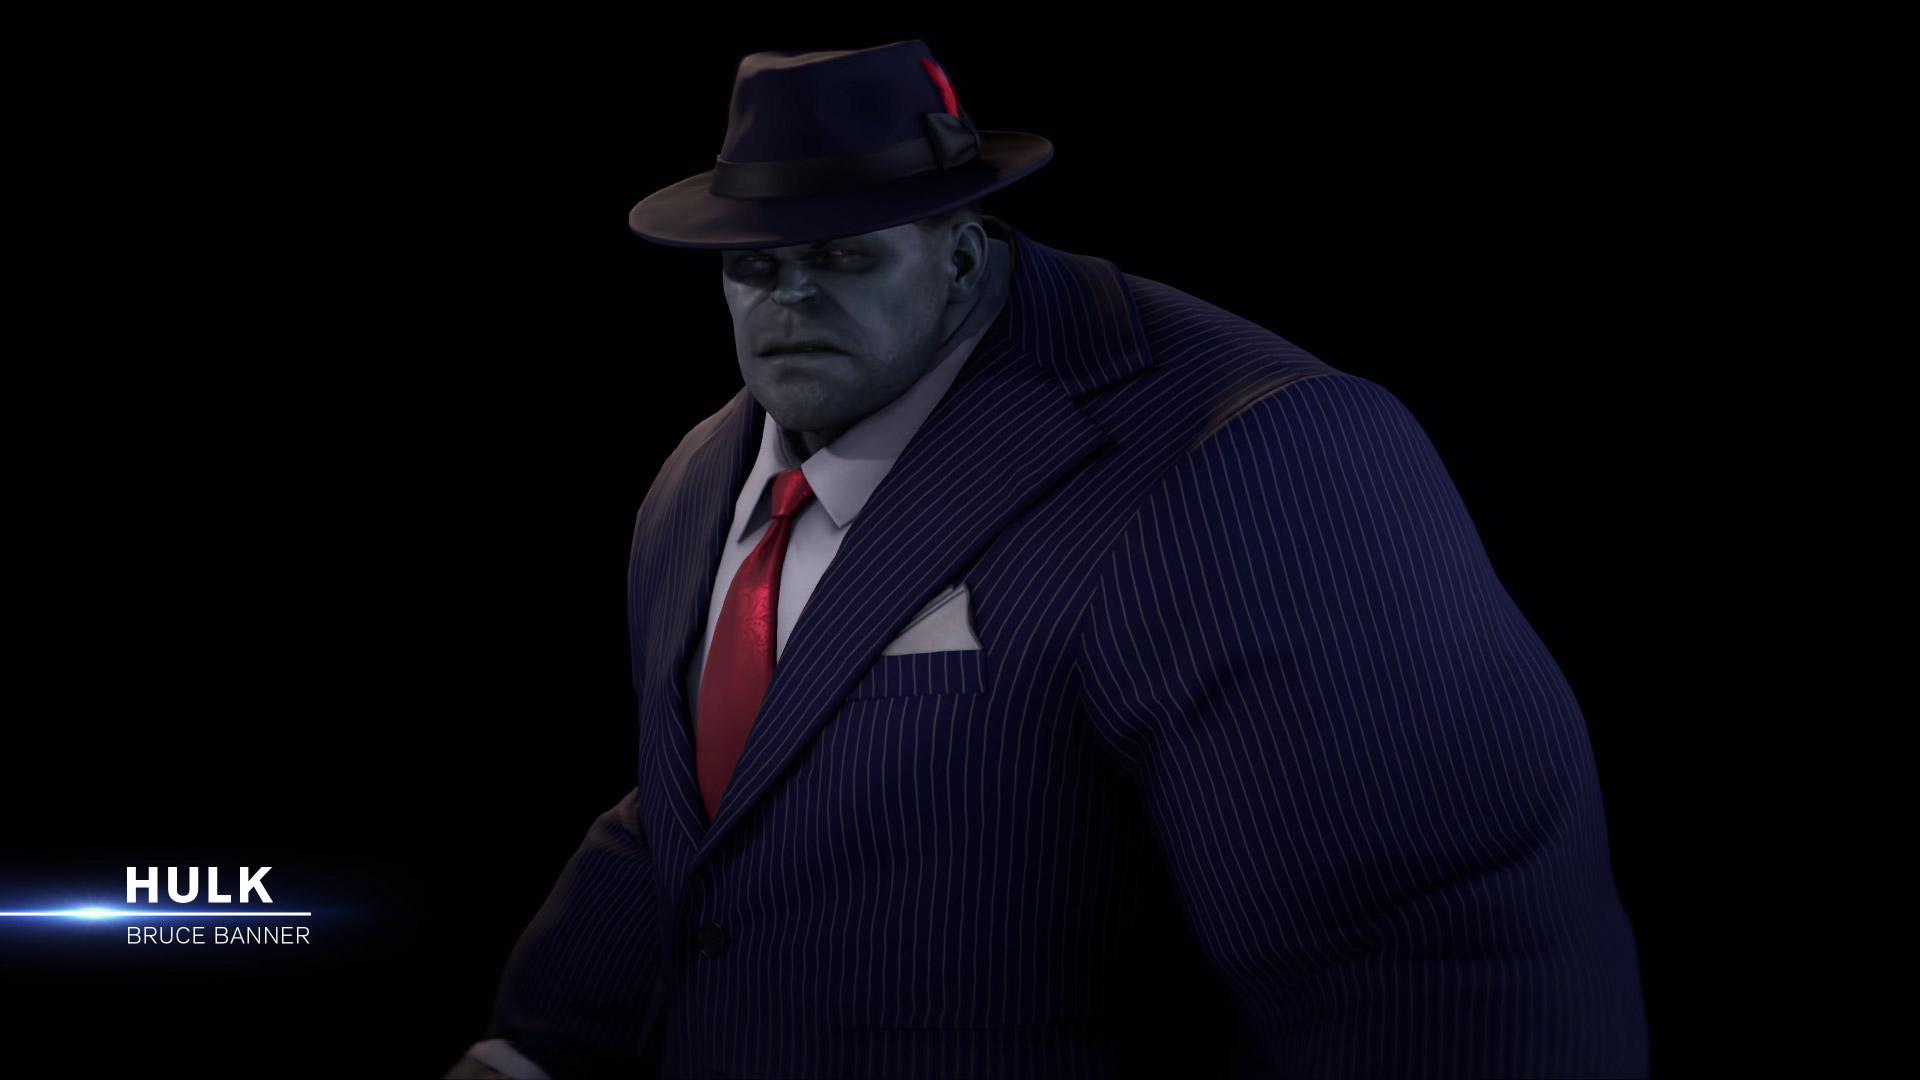 Oh hey, Grey Hulk is in Marvel's Avengers screenshot